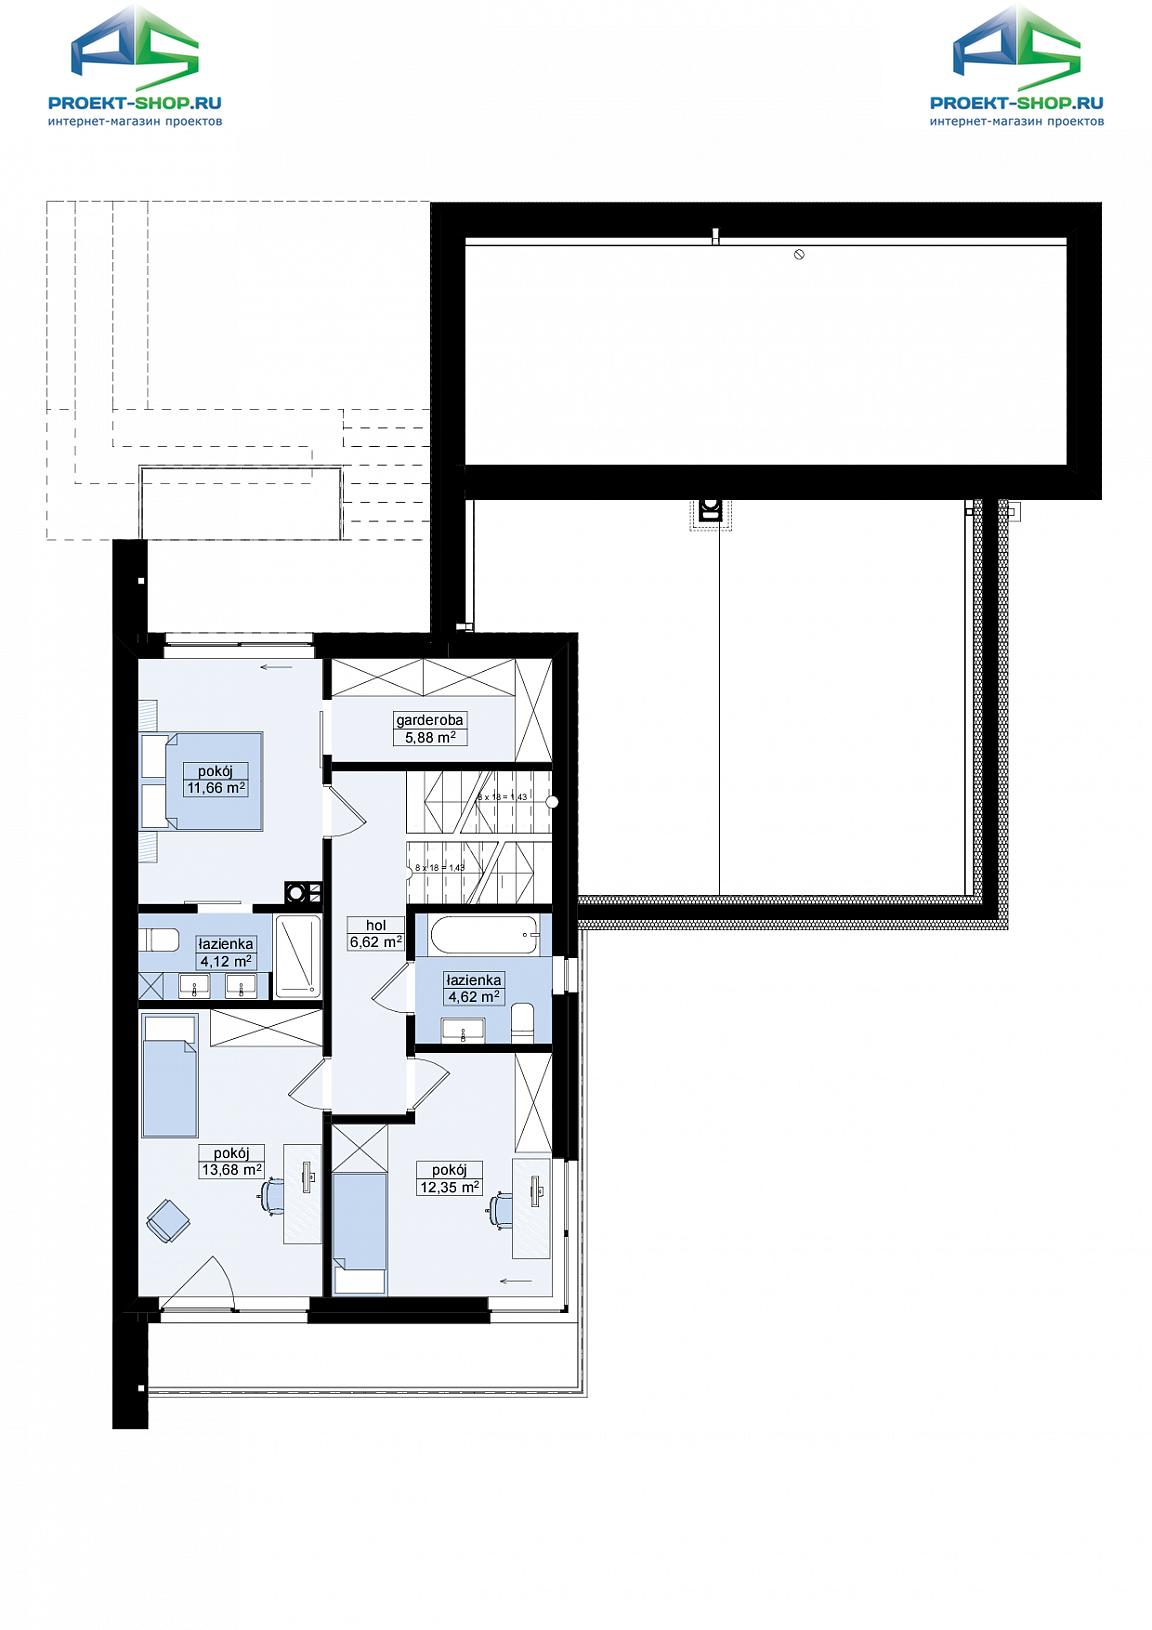 Планировка проекта zx151